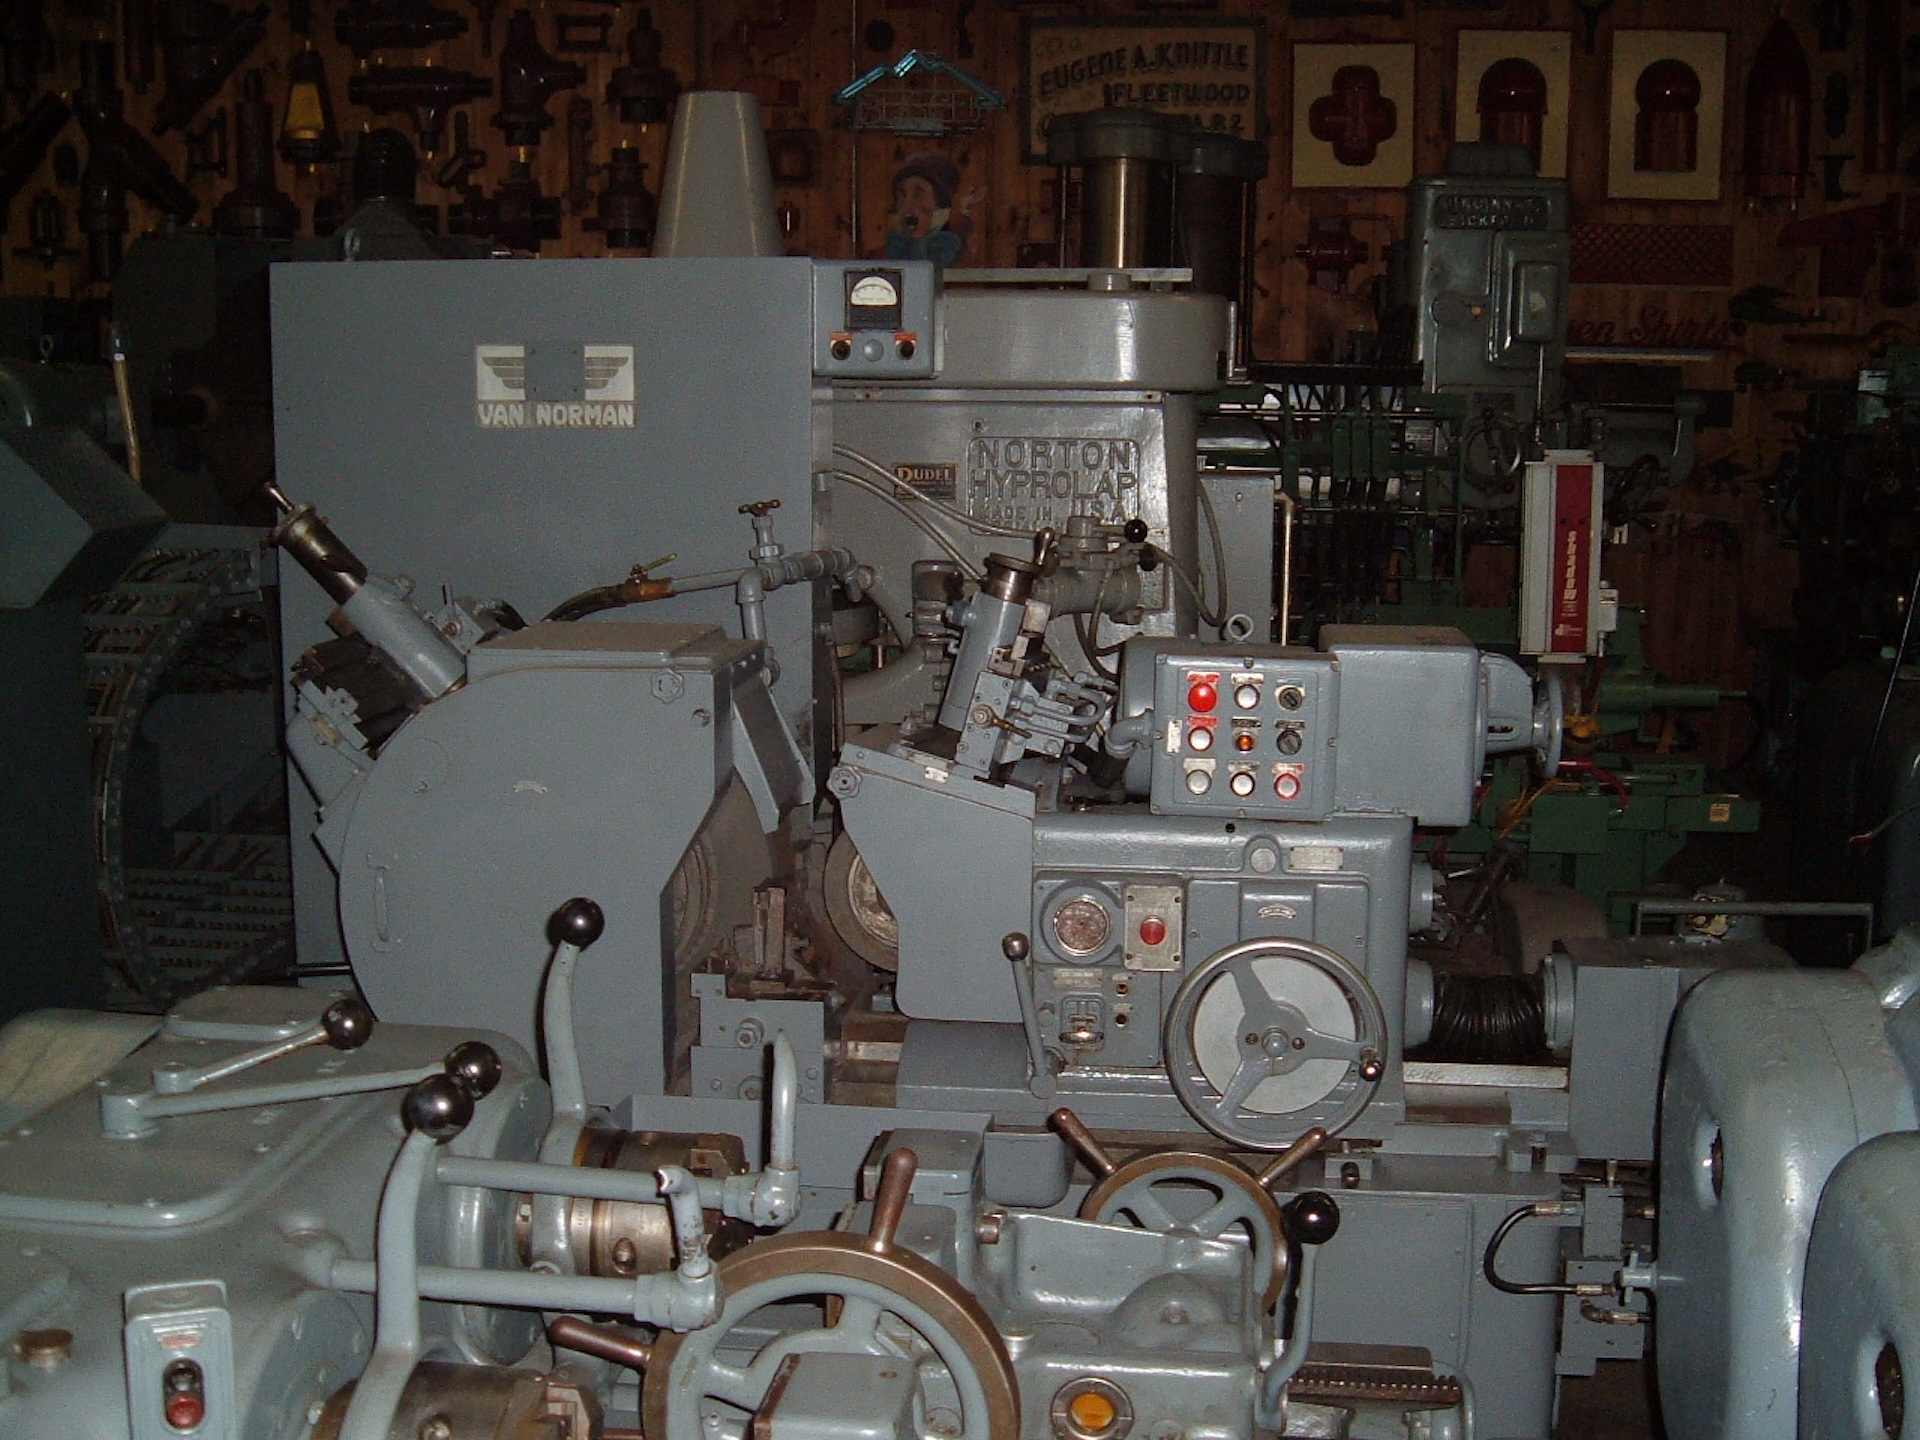 VAN NORMAN 2C CENTERLESS GRINDER: MFG-1962, 15Hp Main, Auto-Infeed, Hard-ways